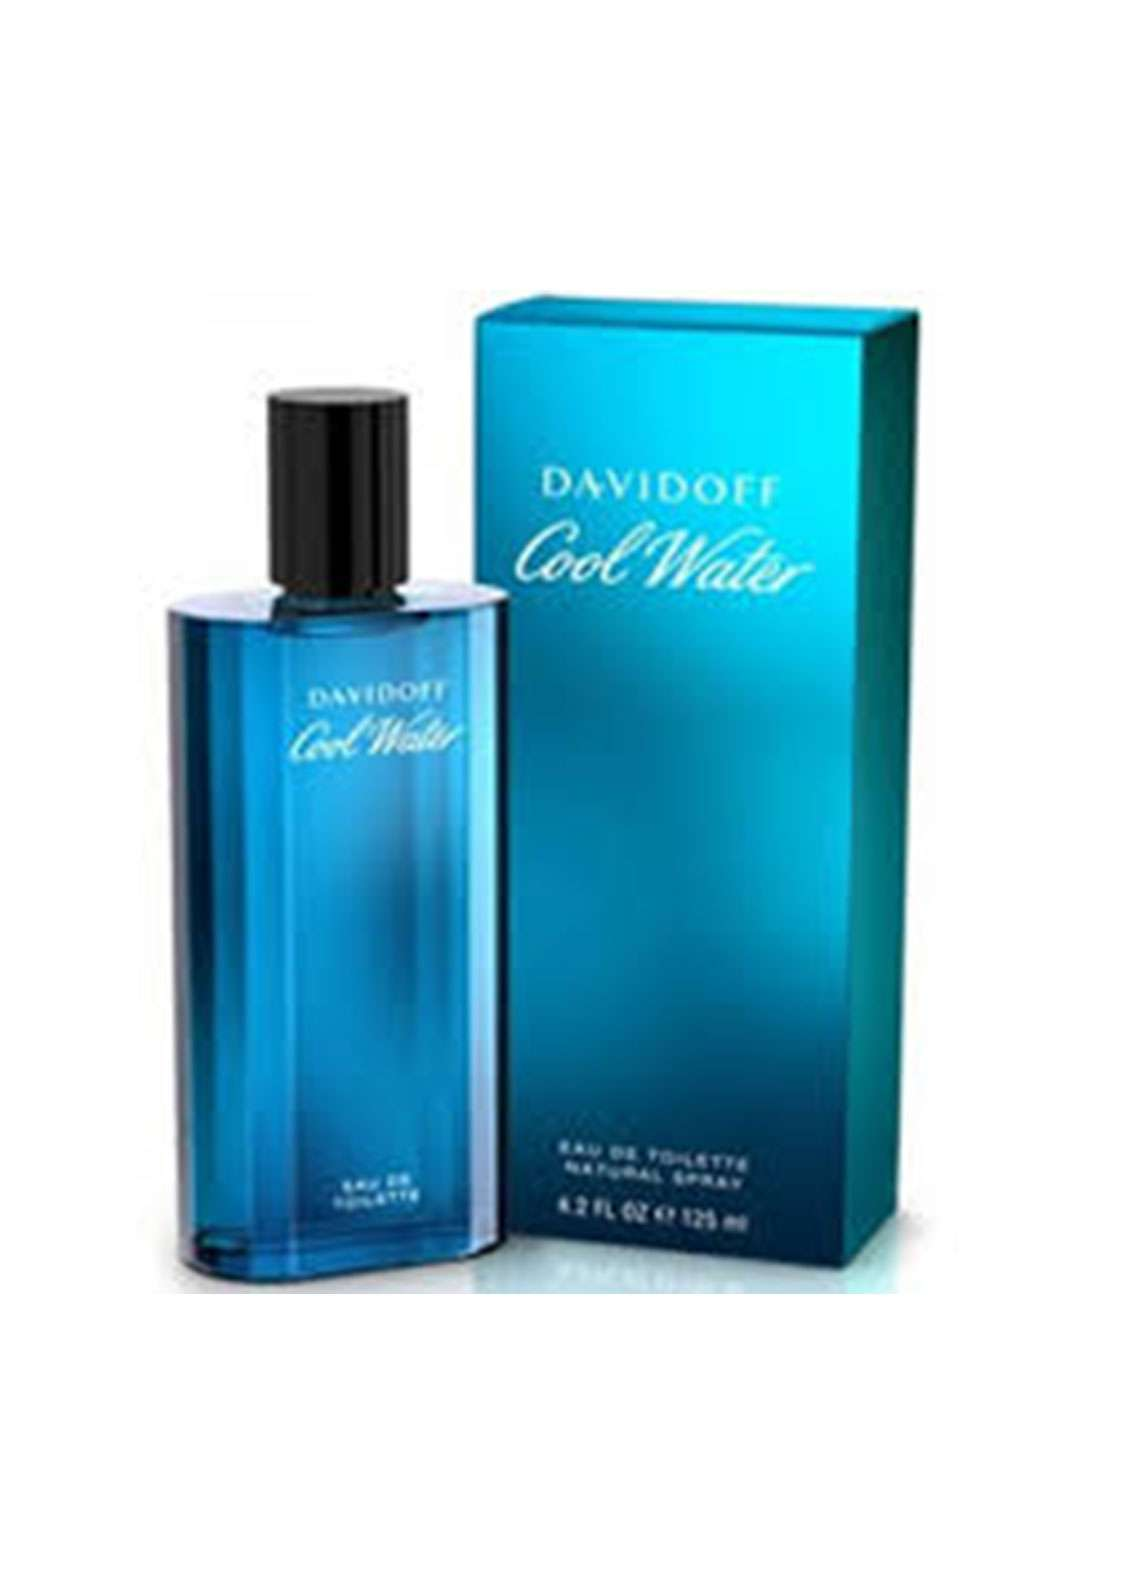 Davidoff Cool Water men's perfume EDT